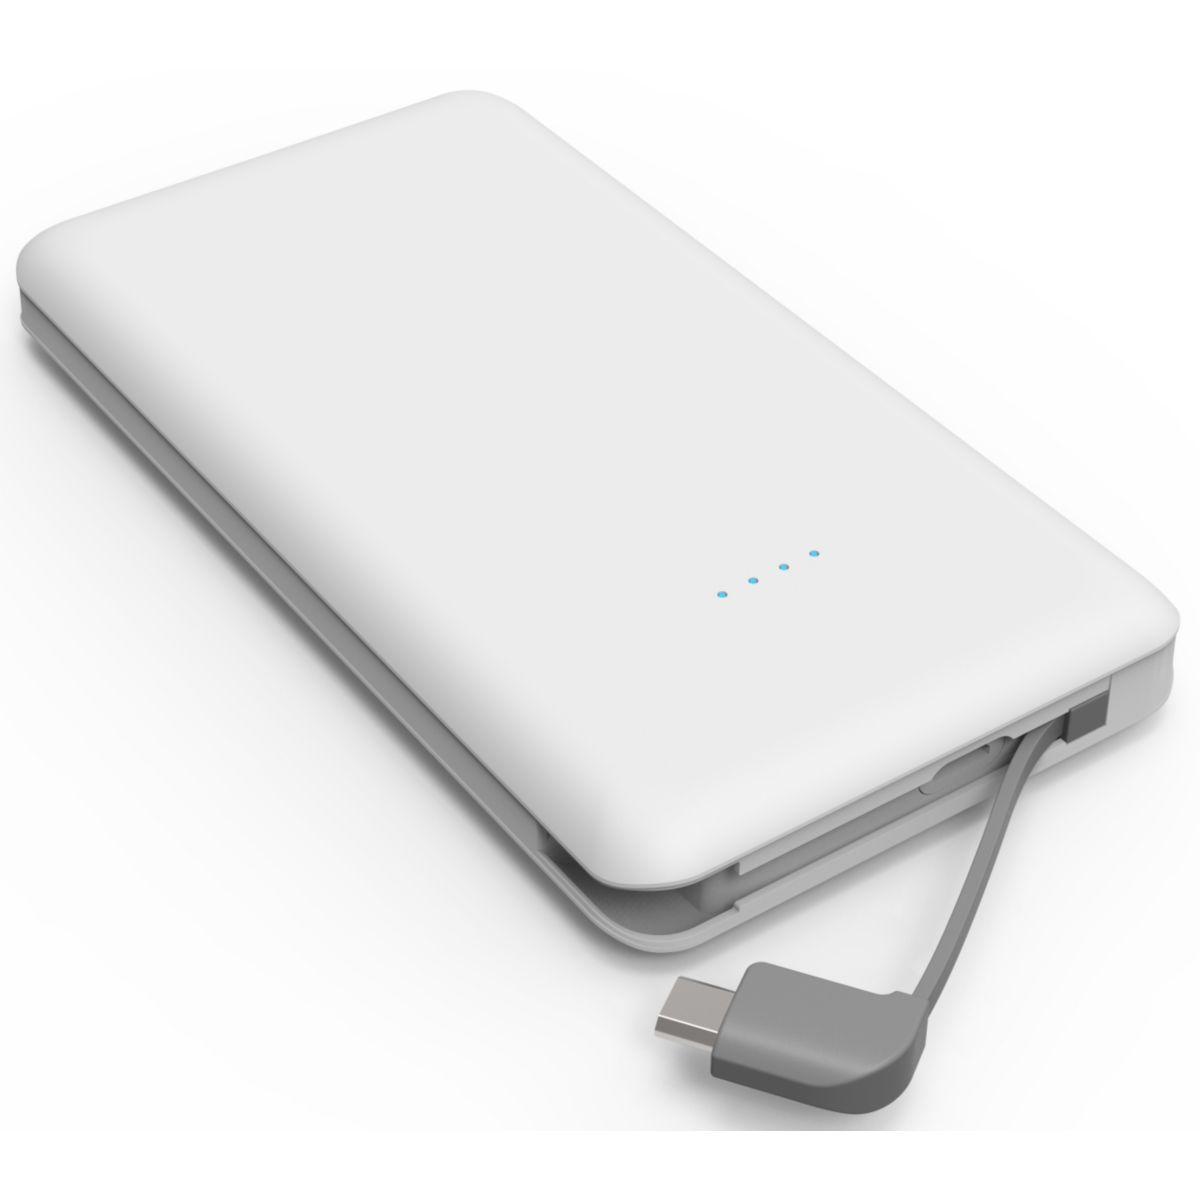 Batterie externe ESSENTIELB 10000 mAh Semaine micro usb -Blanc